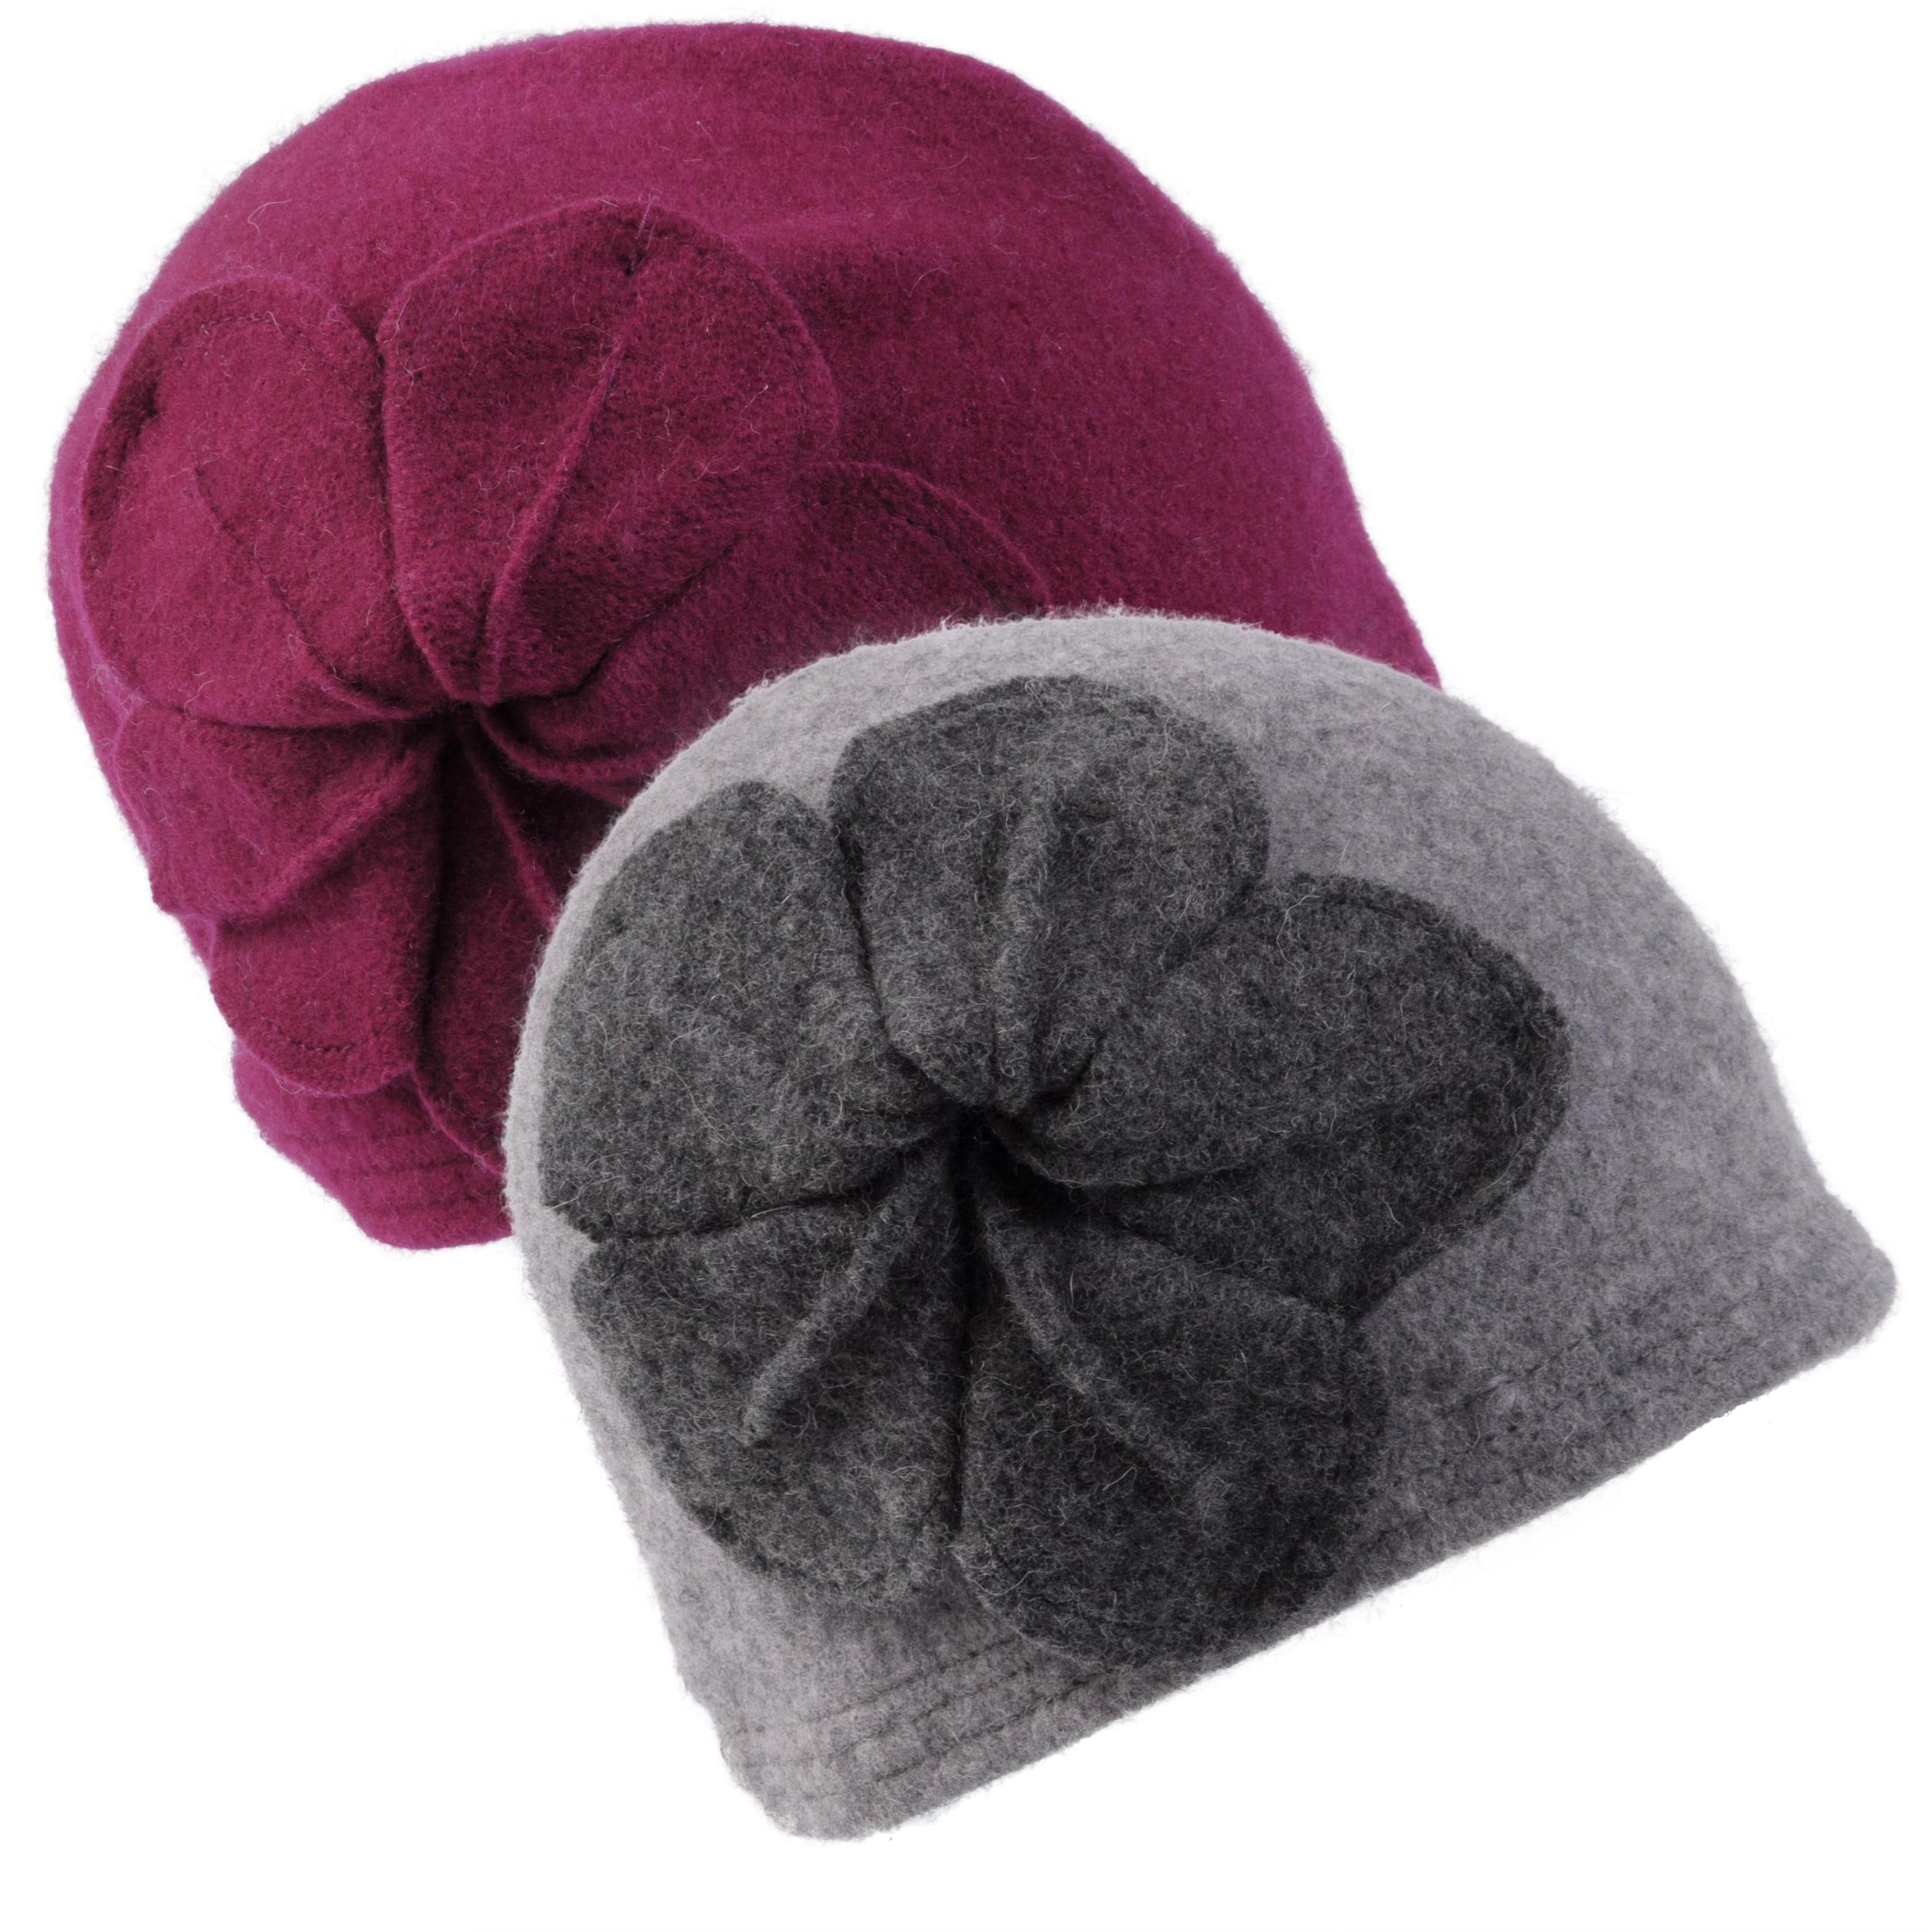 Journee Collection Women's Wool Flower Accent Bucket Hat